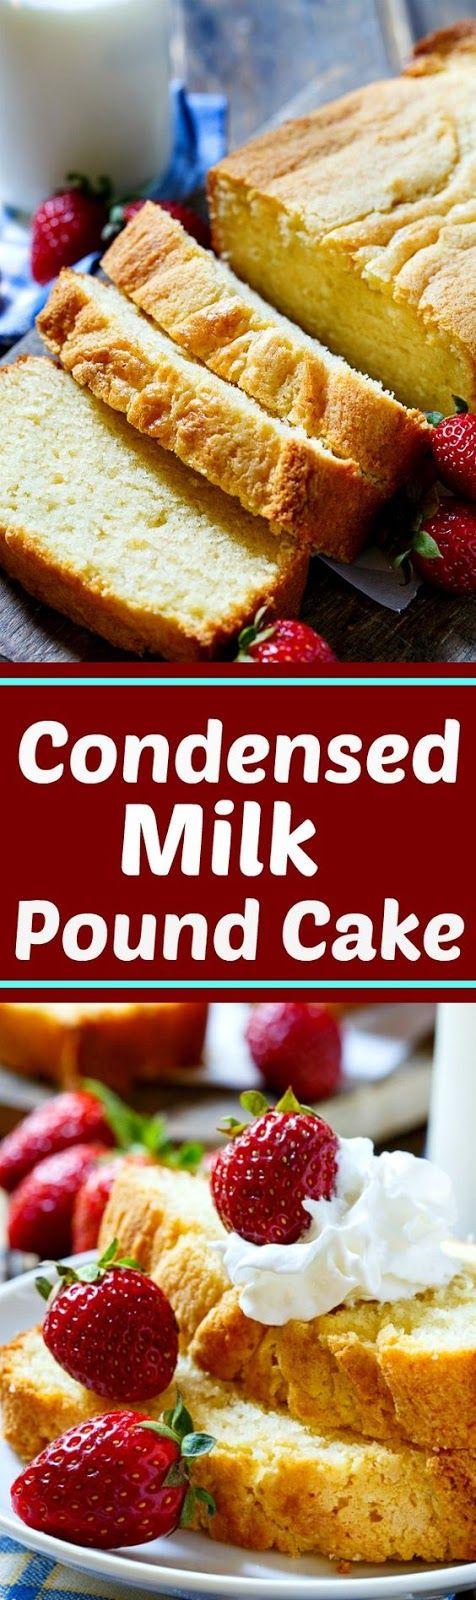 Condensed Milk Pound Cake | Cake And Food Recipe